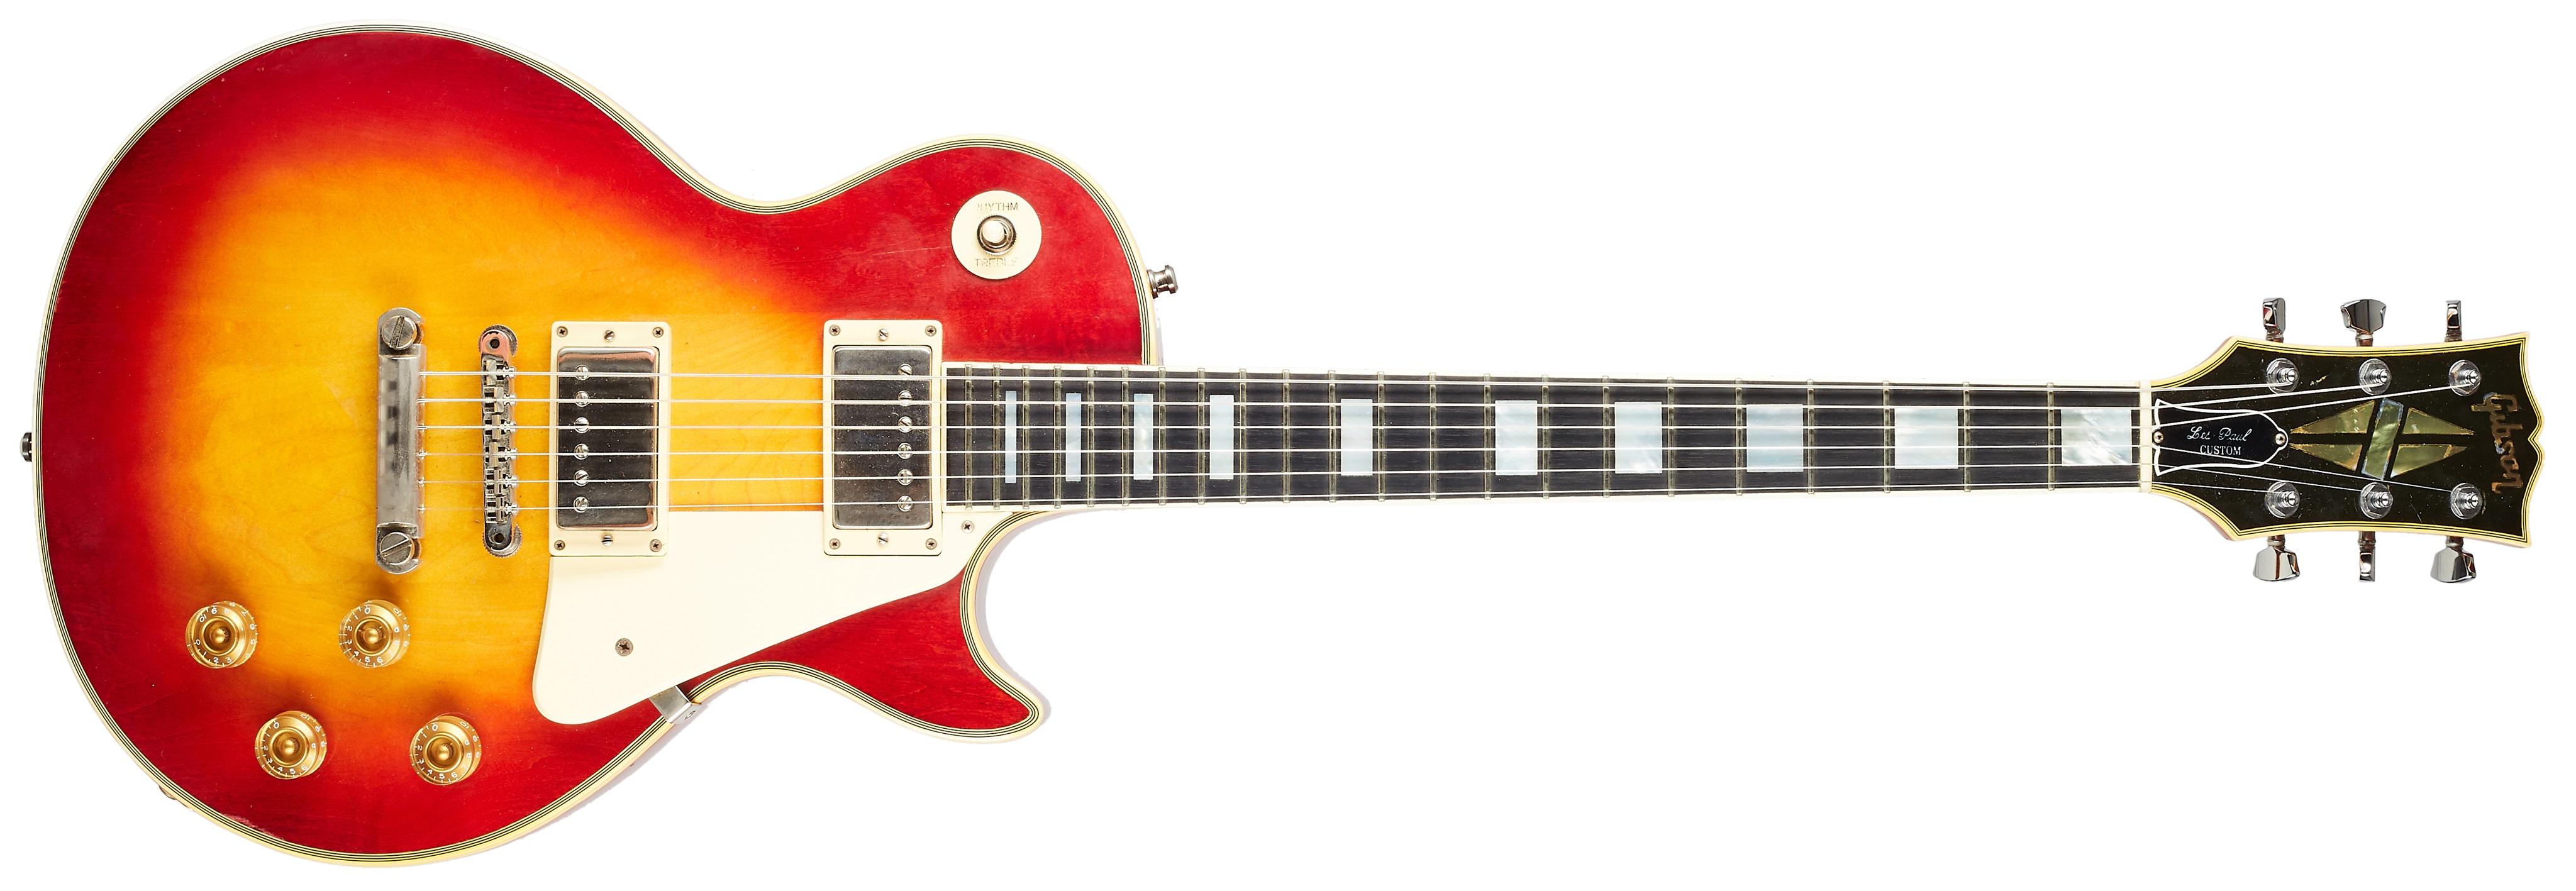 Gibson 1972 Les Paul Custom